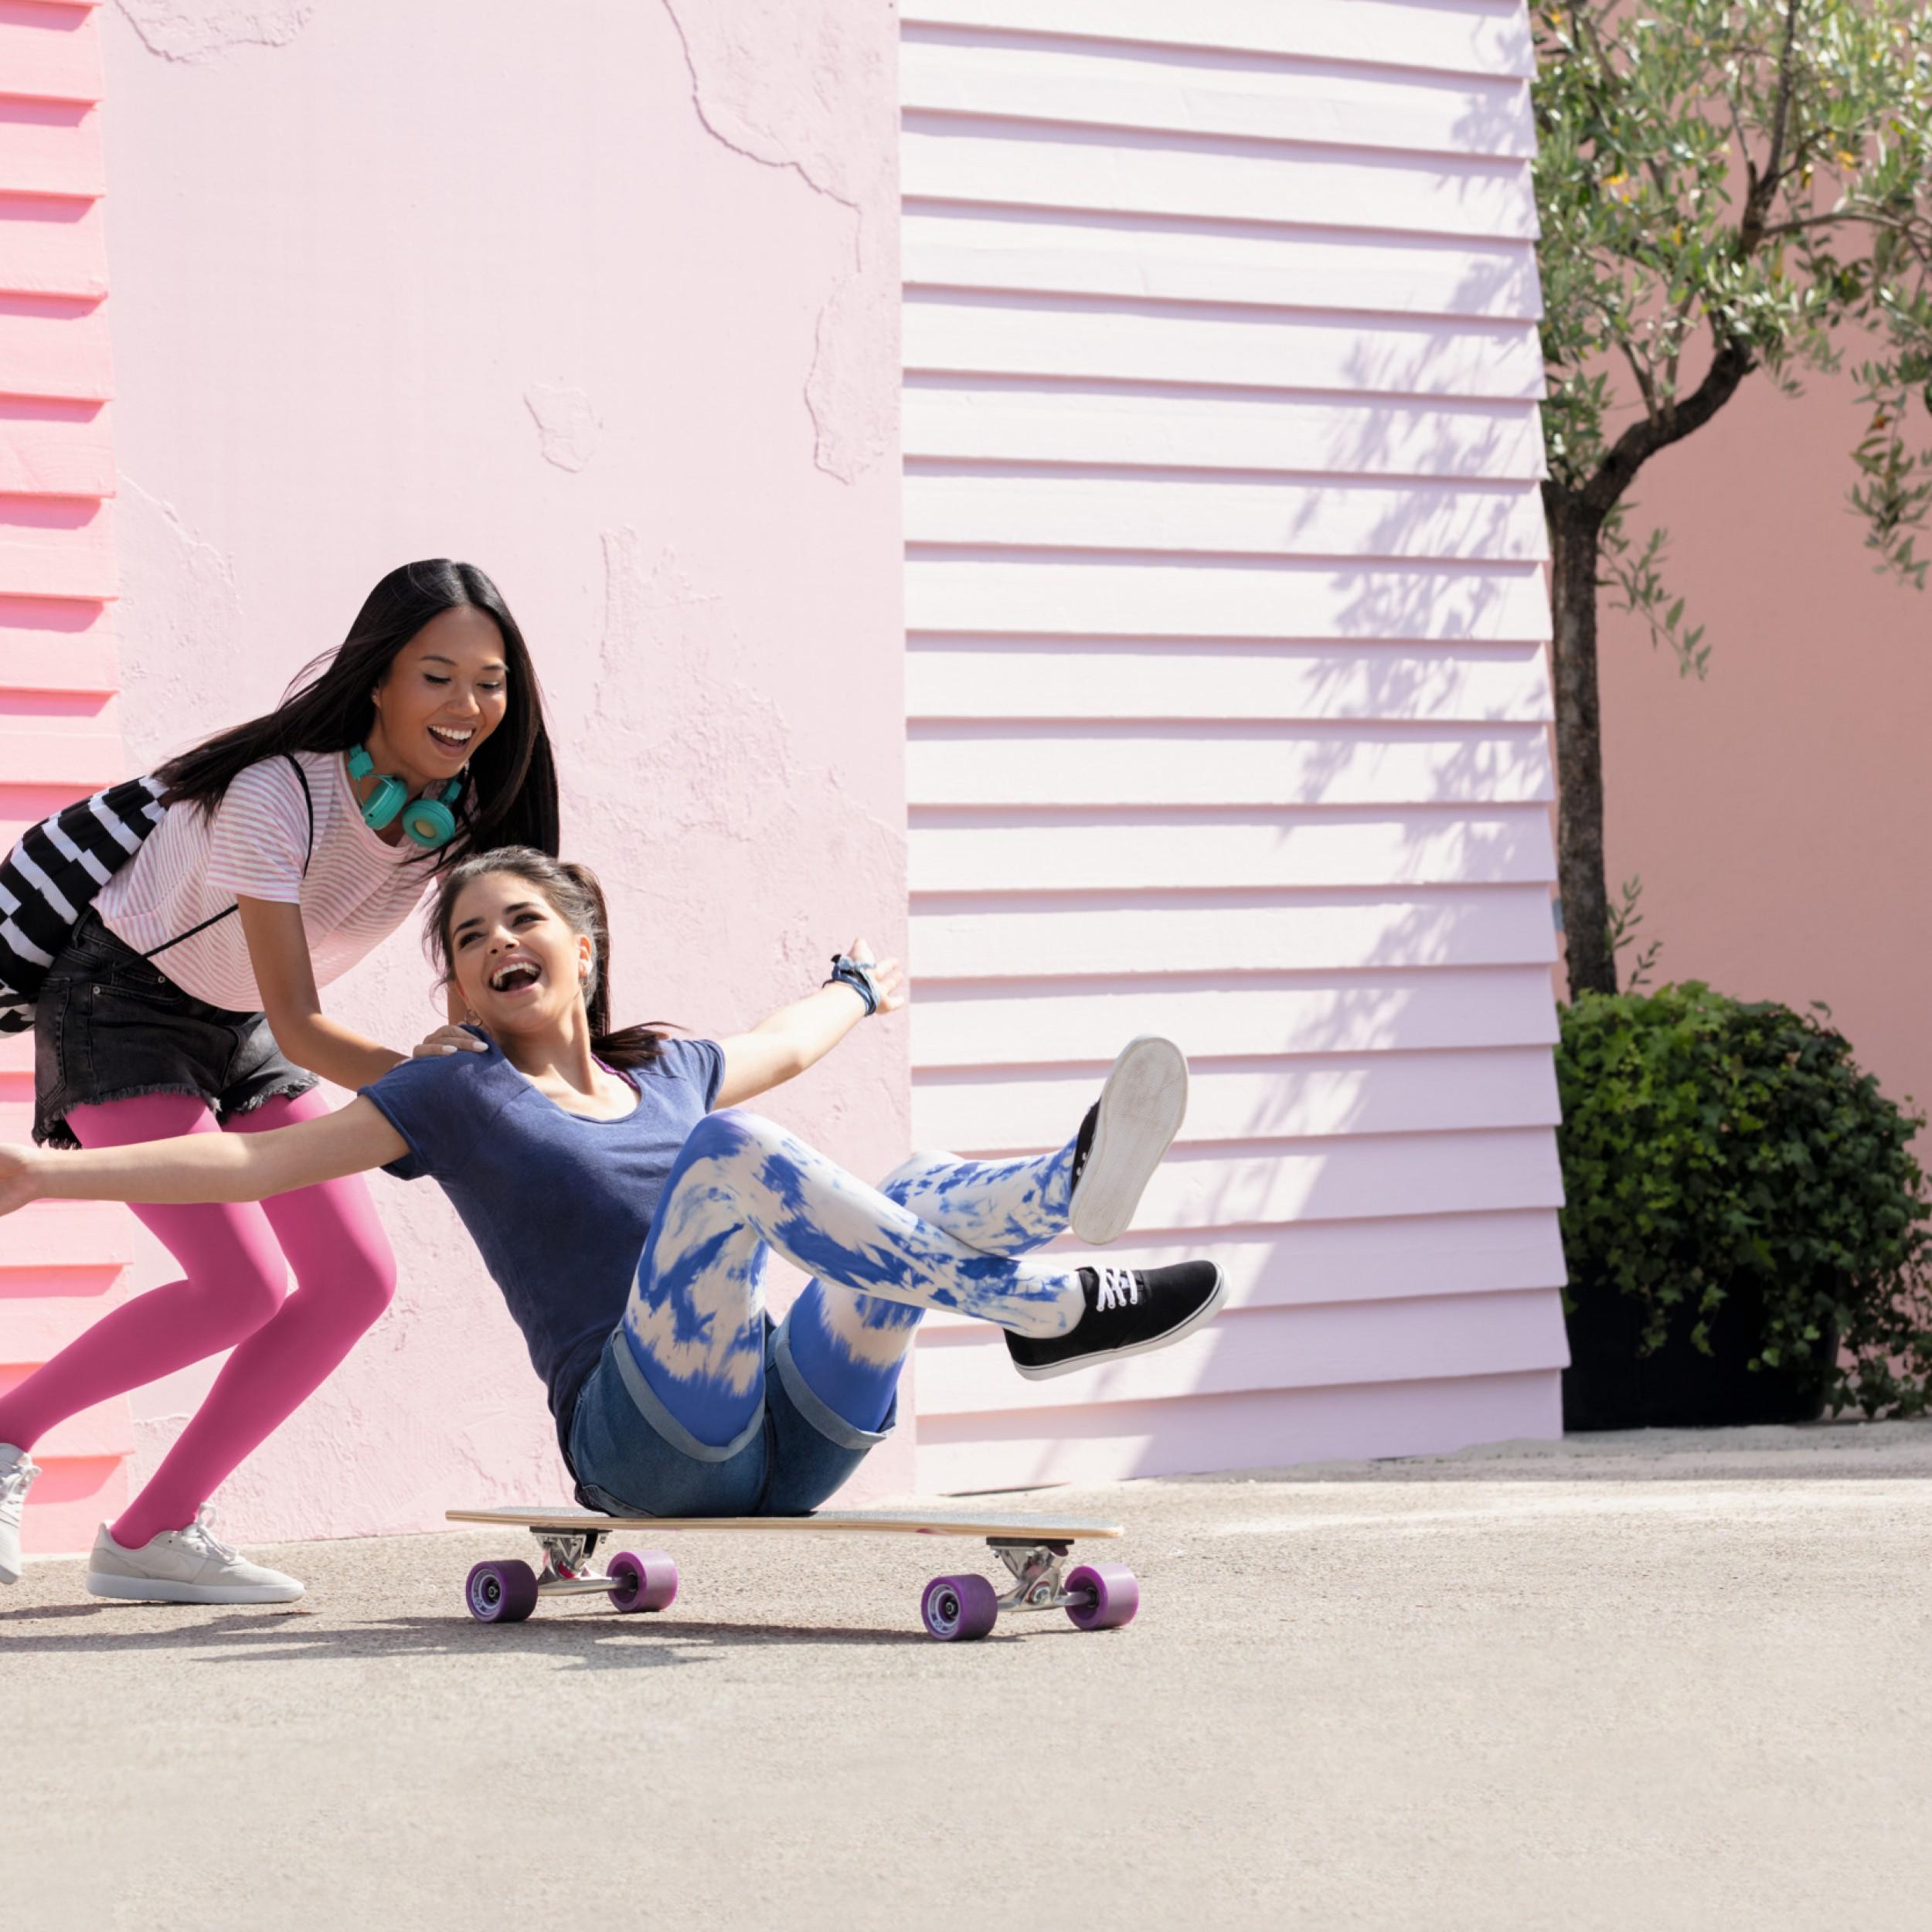 Lifestyle_Juzo_TrendColours2020_Pink_Blue_Batik